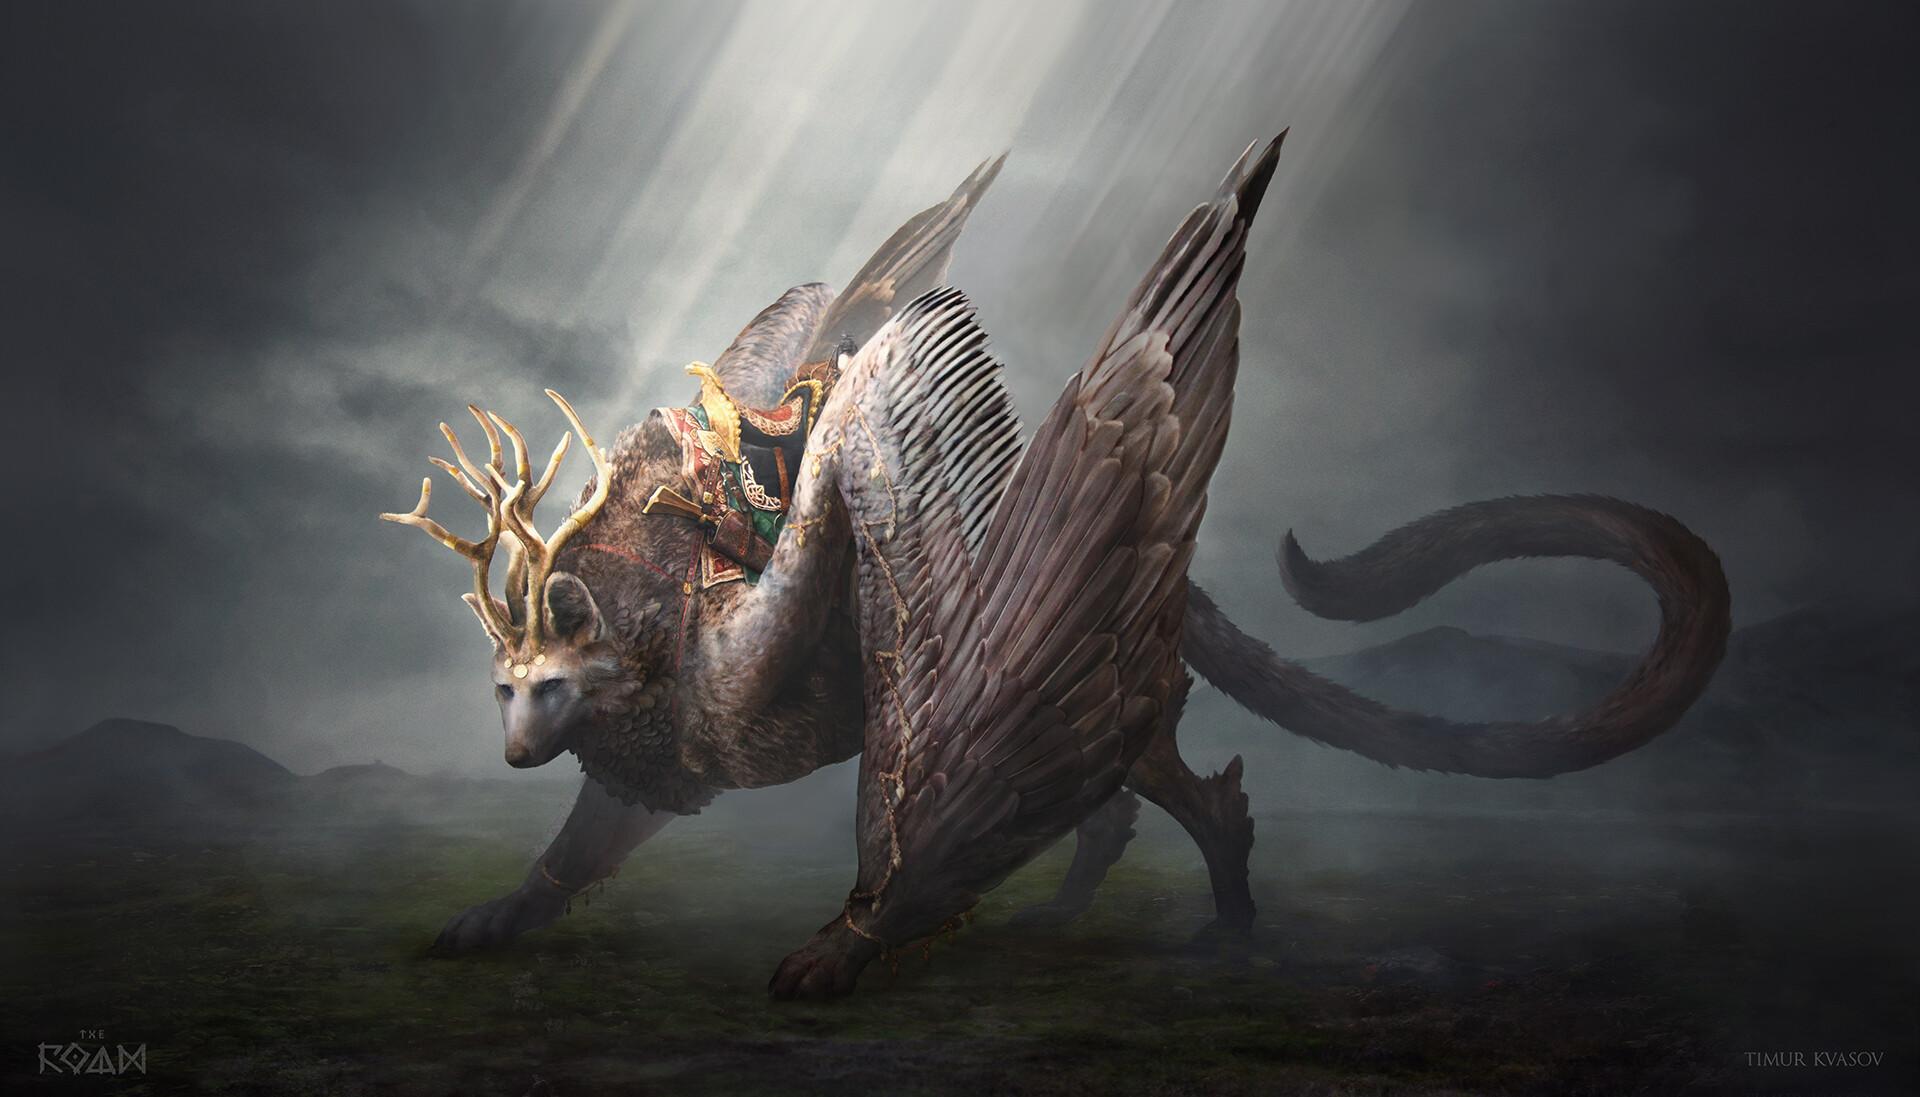 Timur kvasov semargl 01 concept final